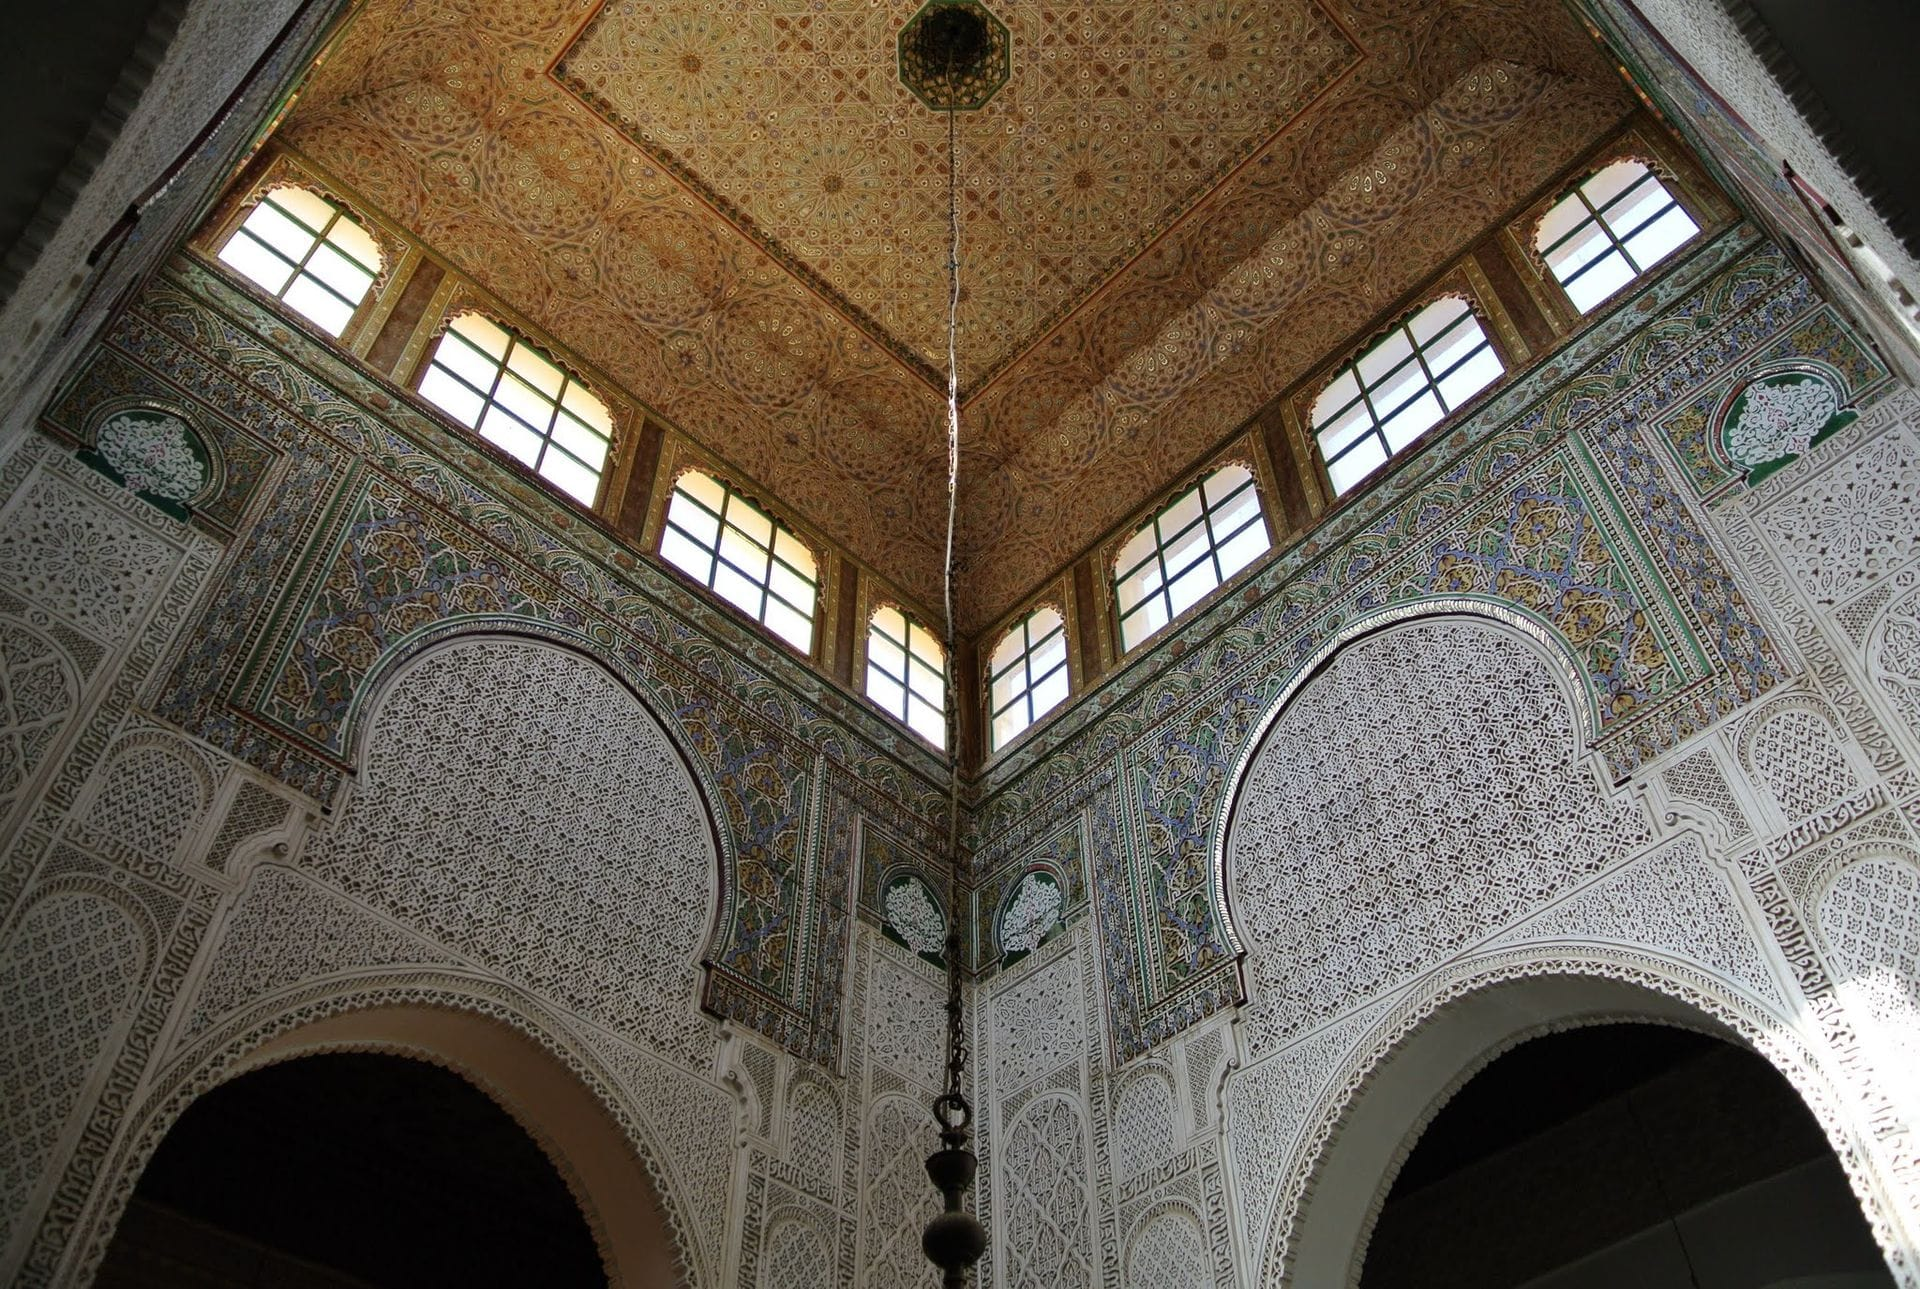 Sidi_Amar_Hassini,_Meknes,_Morocco_-_panoramio_(5)